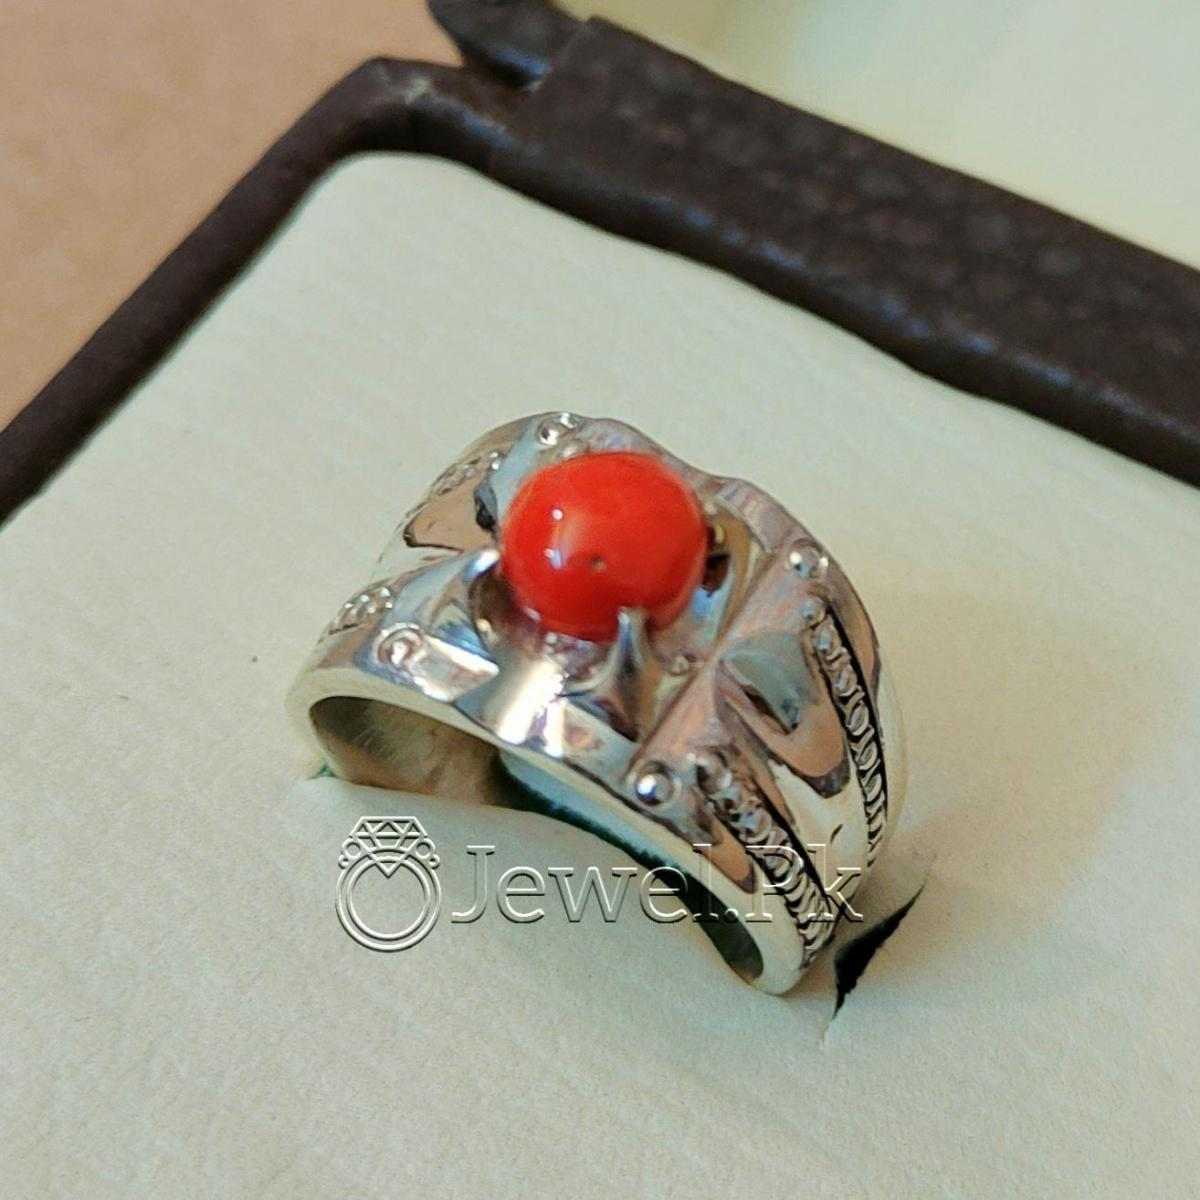 Natural Coral Marjan Ring Handmade 925 Silver Marjan stone 6 natural gemstones pakistan + 925 silver jewelry online